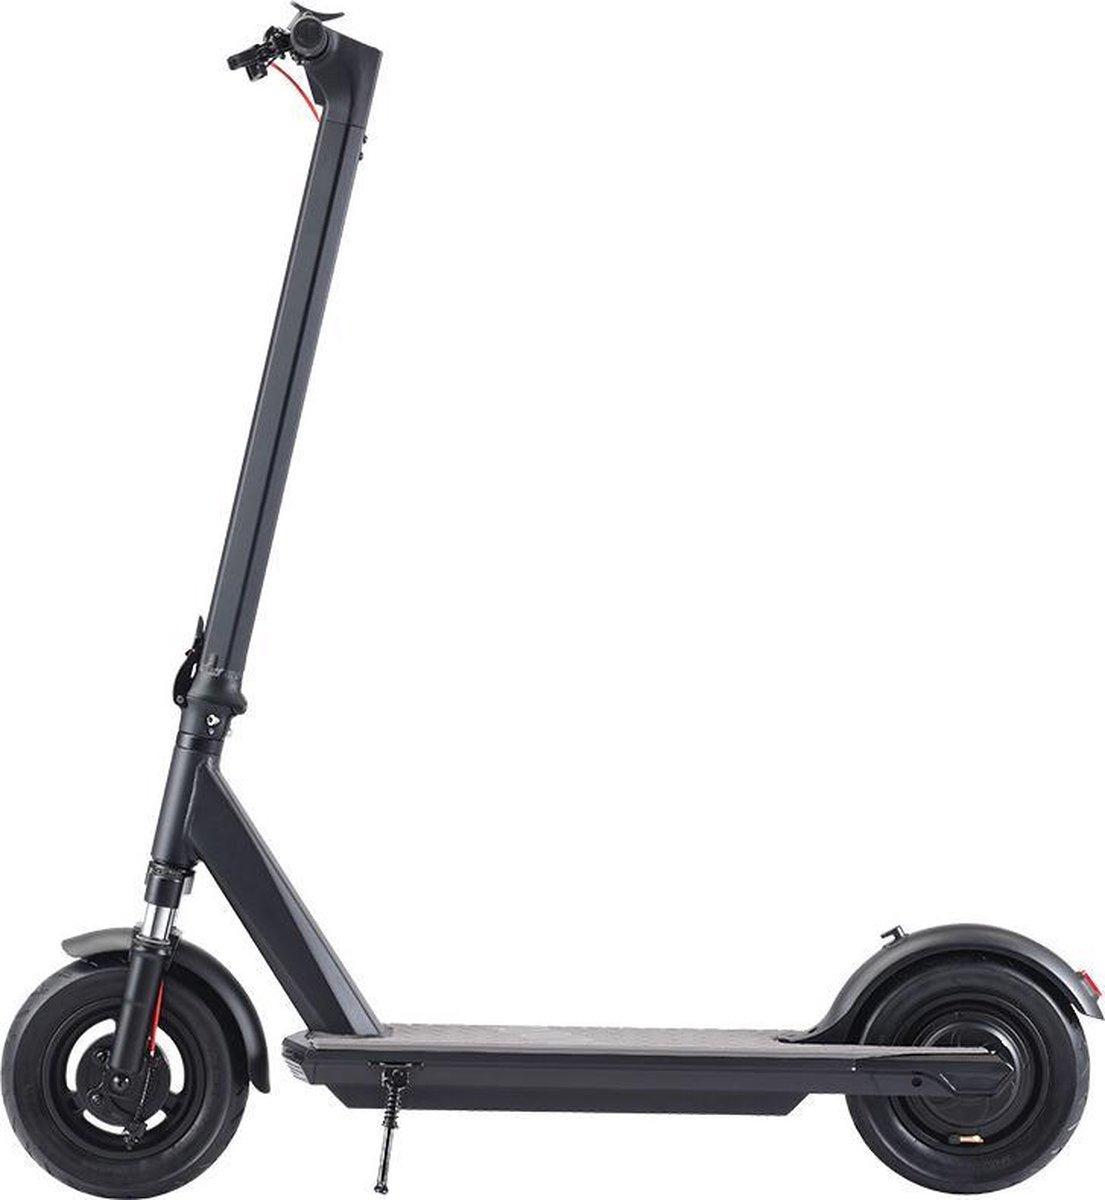 Luxiqo Elektrische Step 35 km/u 35 km bereik Elektrische step voor volwassenen Elektrische step voor kinderen 350 W online kopen